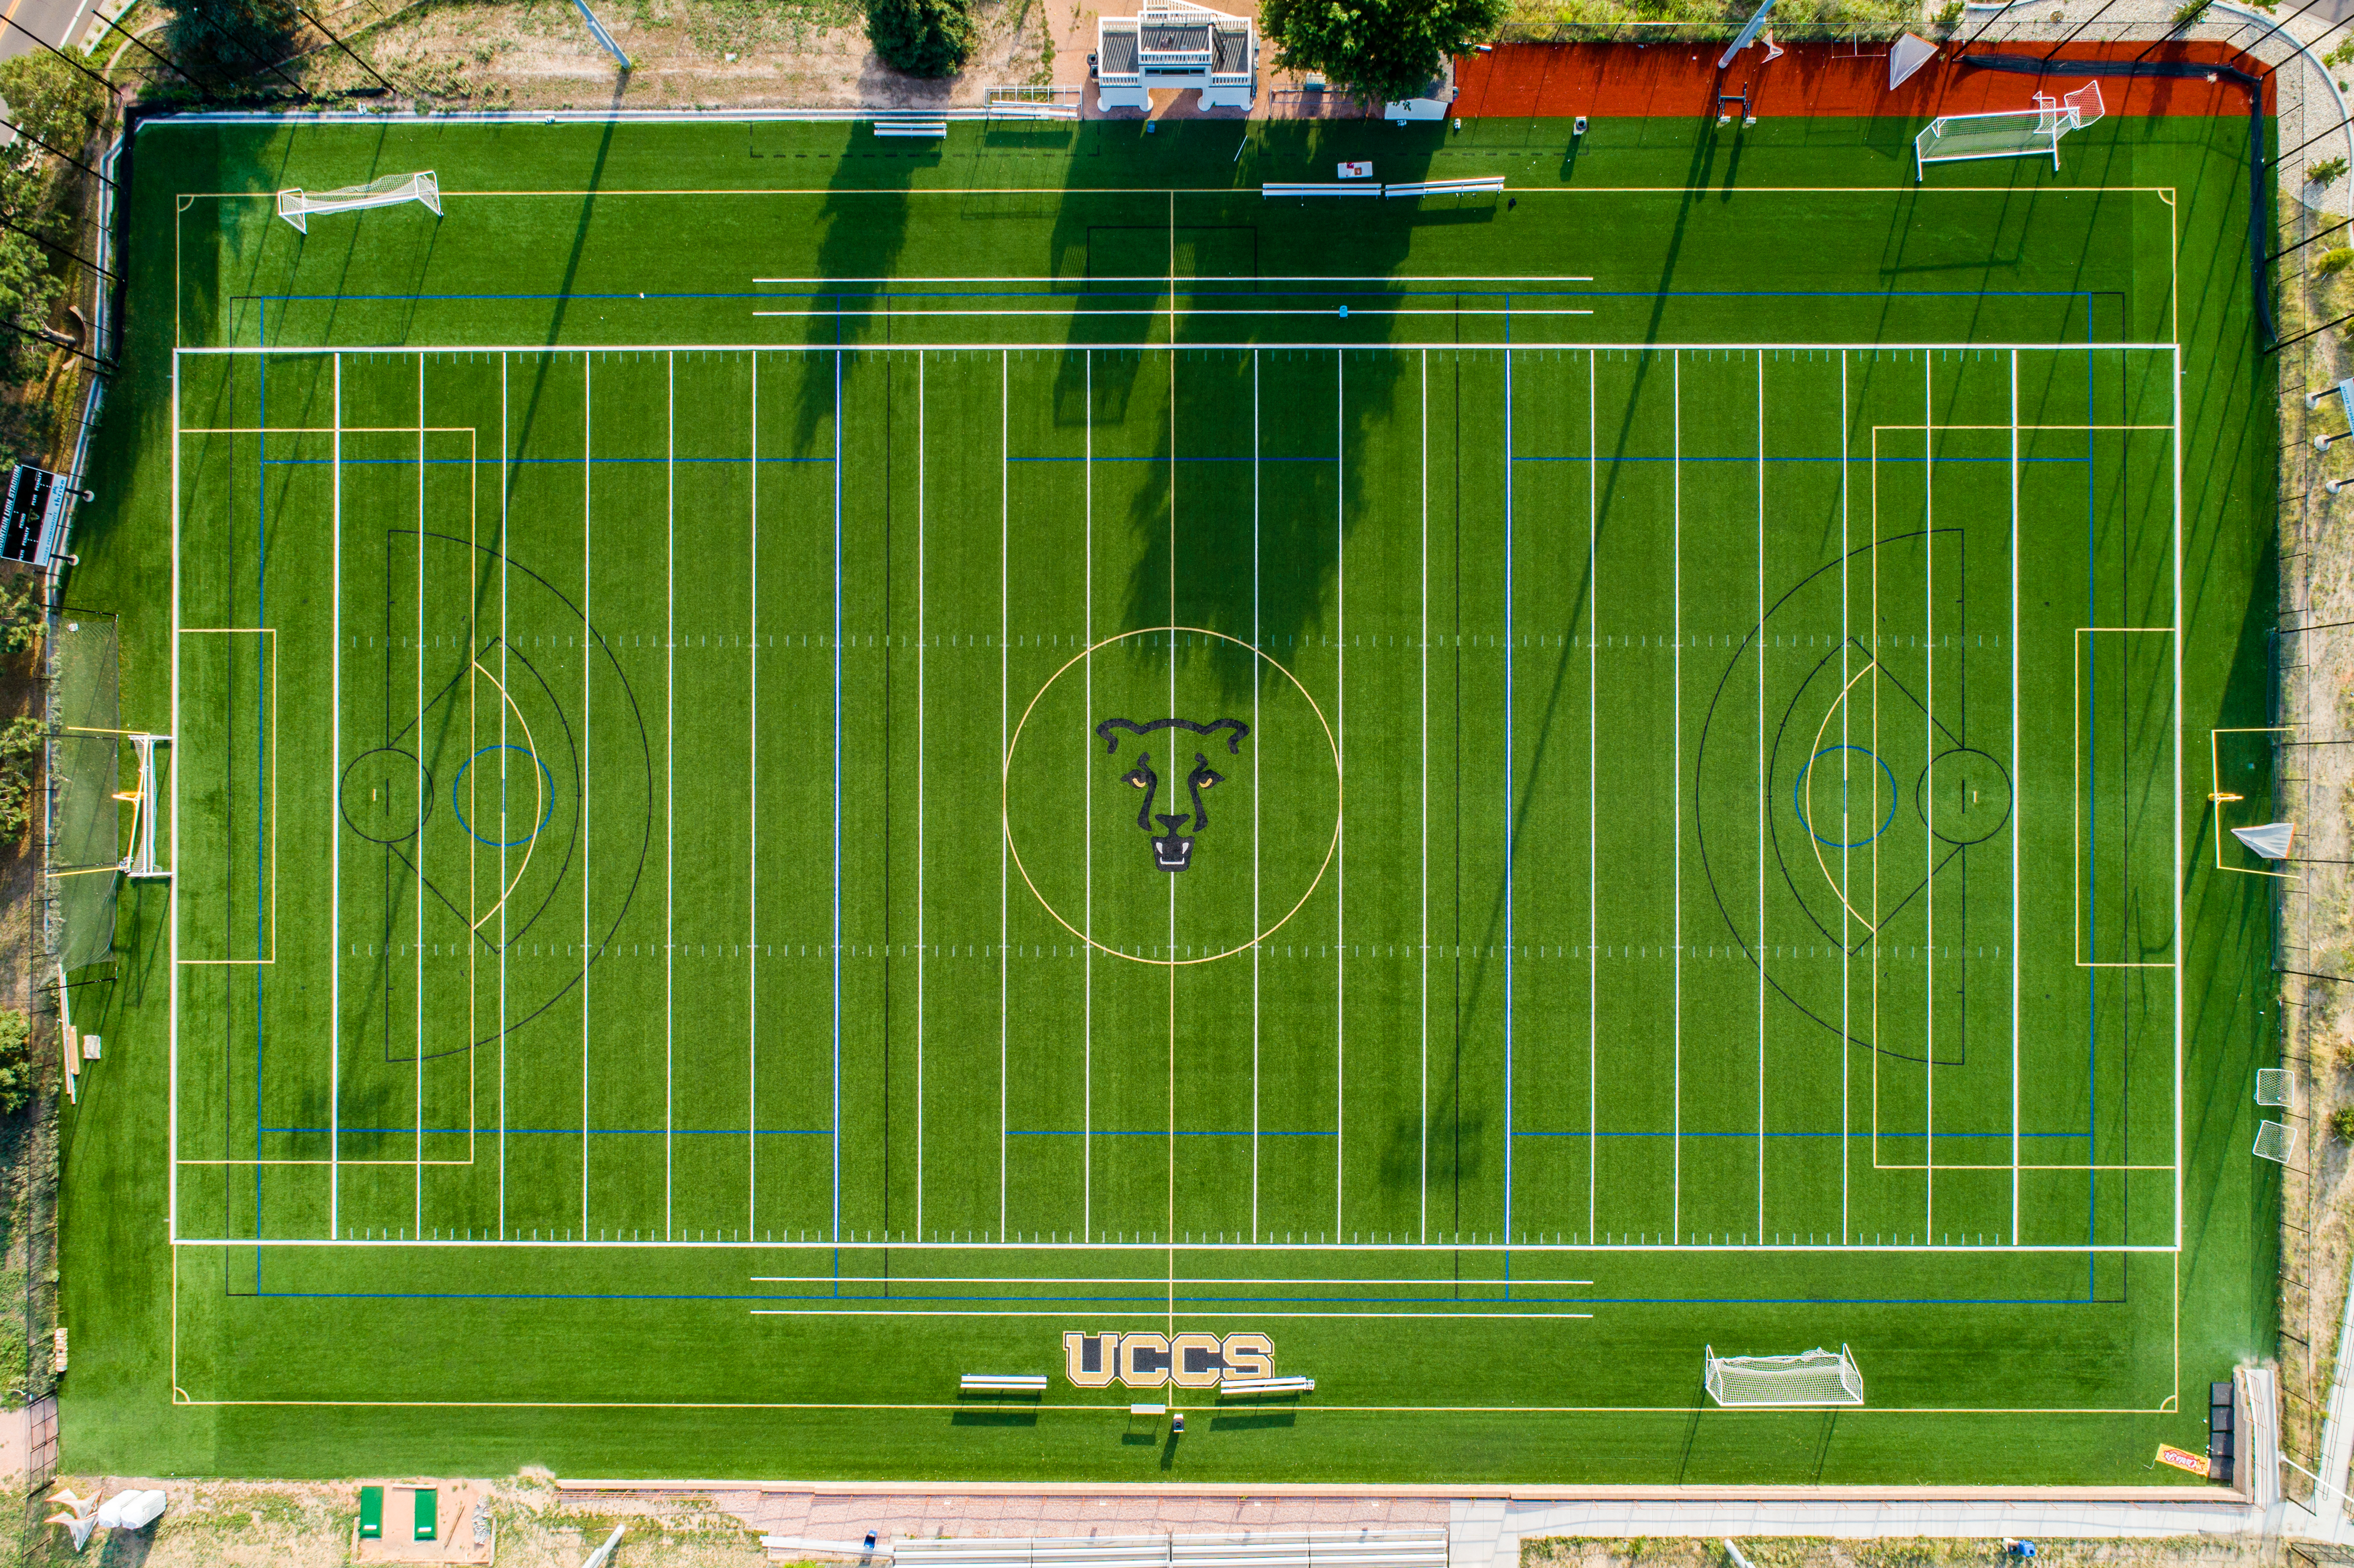 UCCS Soccer Field